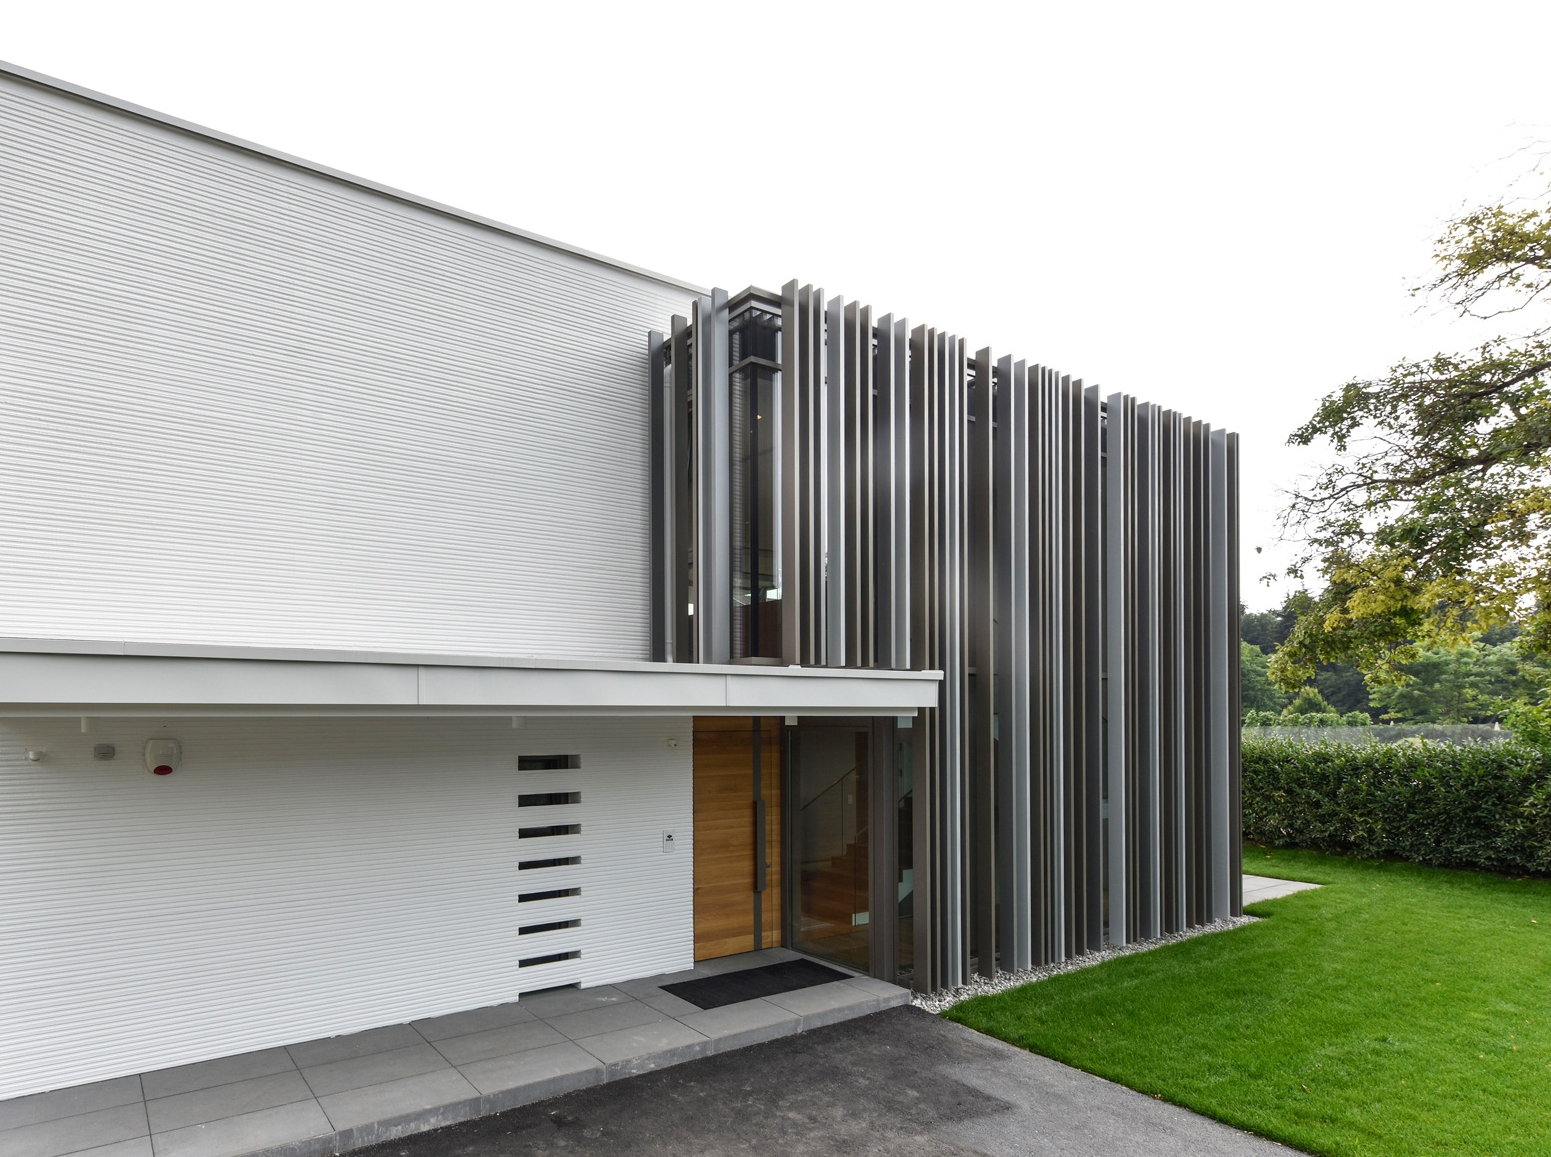 A01 architects - Residence Krumpendorf_(c) Hannes Kohlmeier__web02.jpg